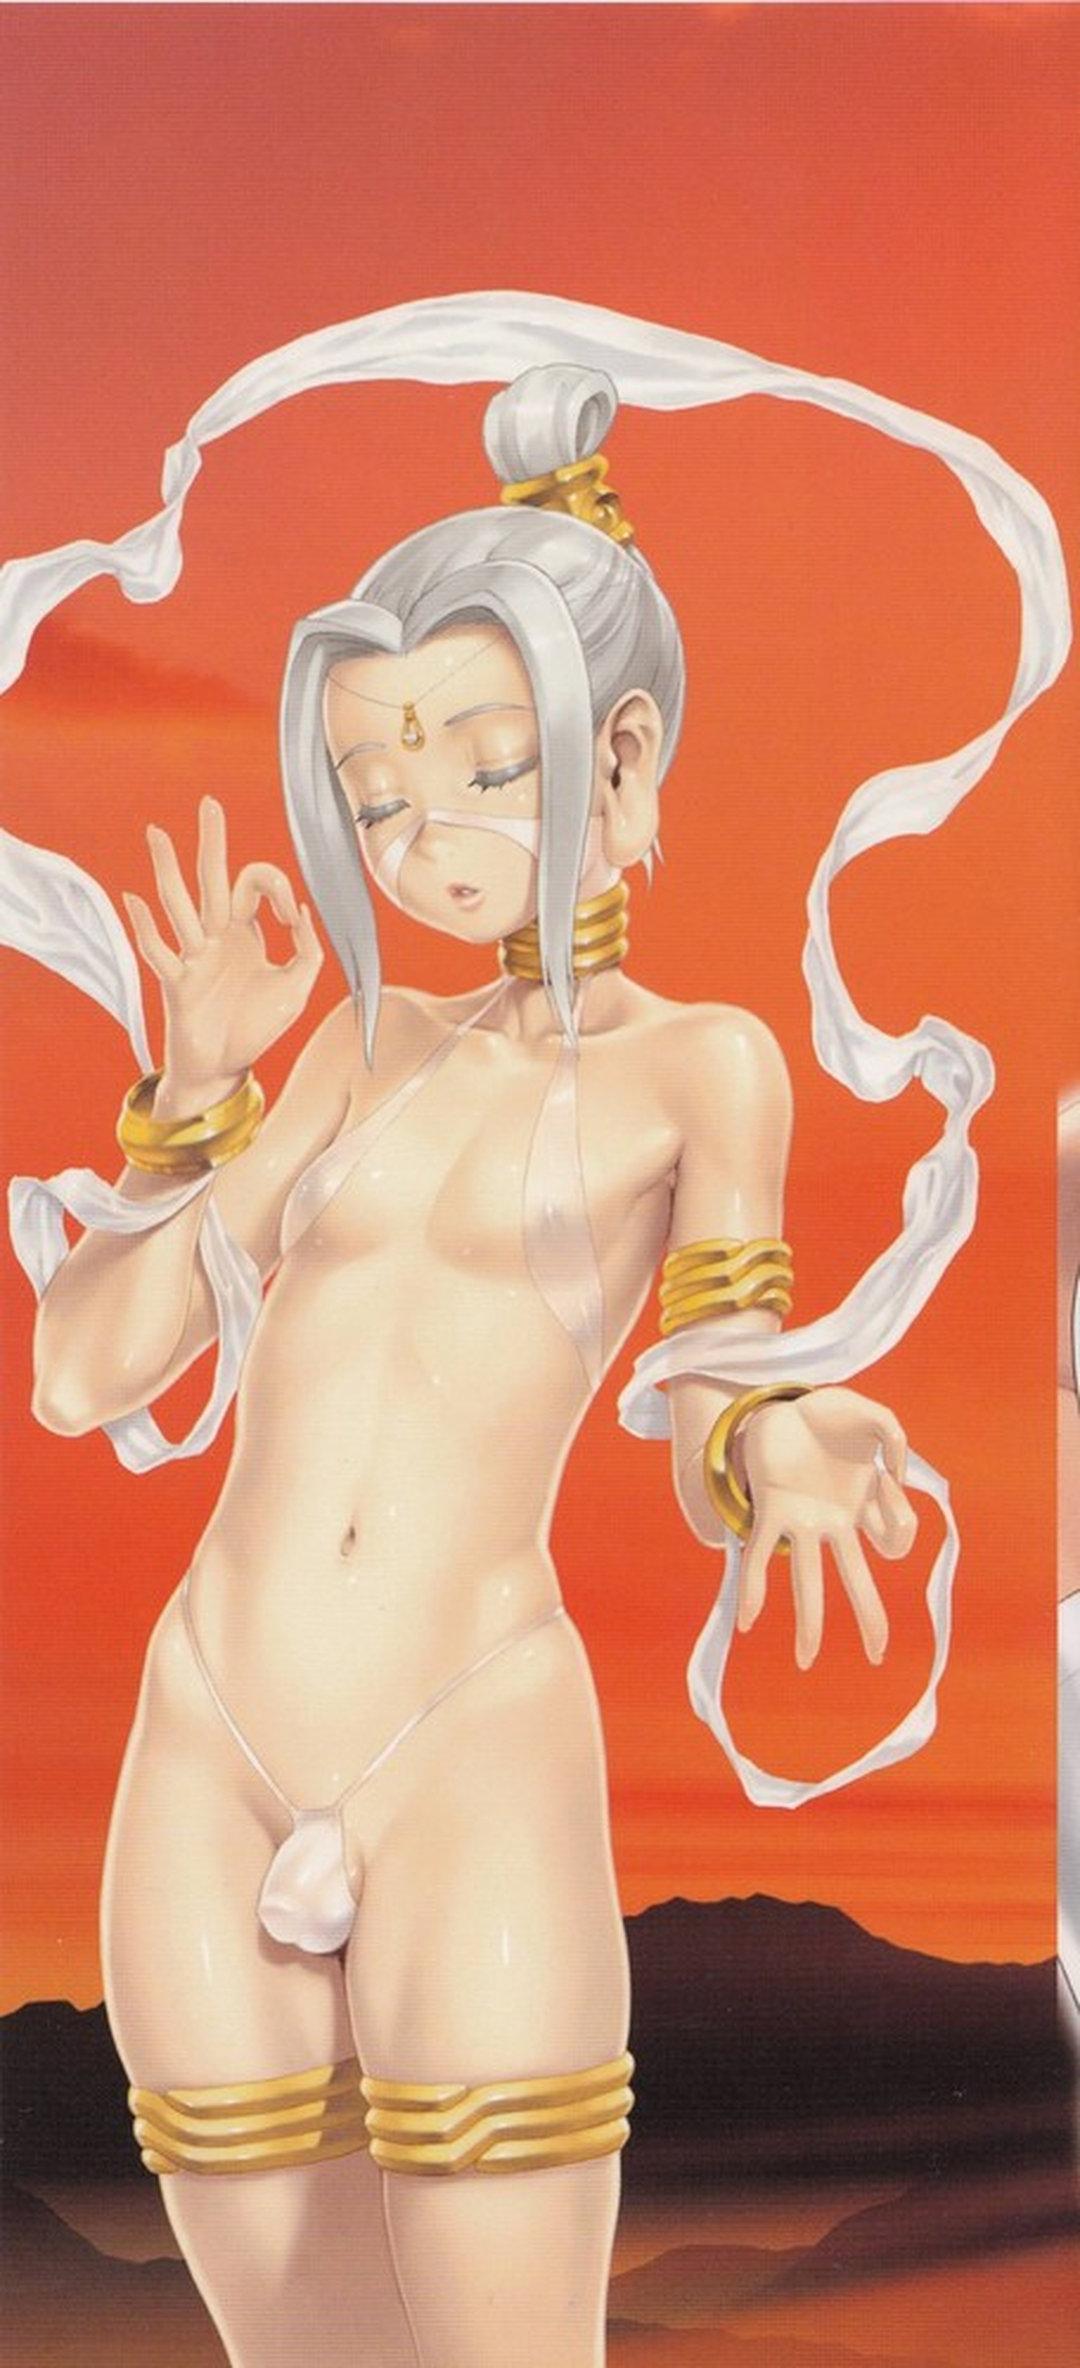 [SECRET JOURNEY VOL.1]三蔵法師と孫悟空のおねショタプレイ[エロアニメ]  (40)